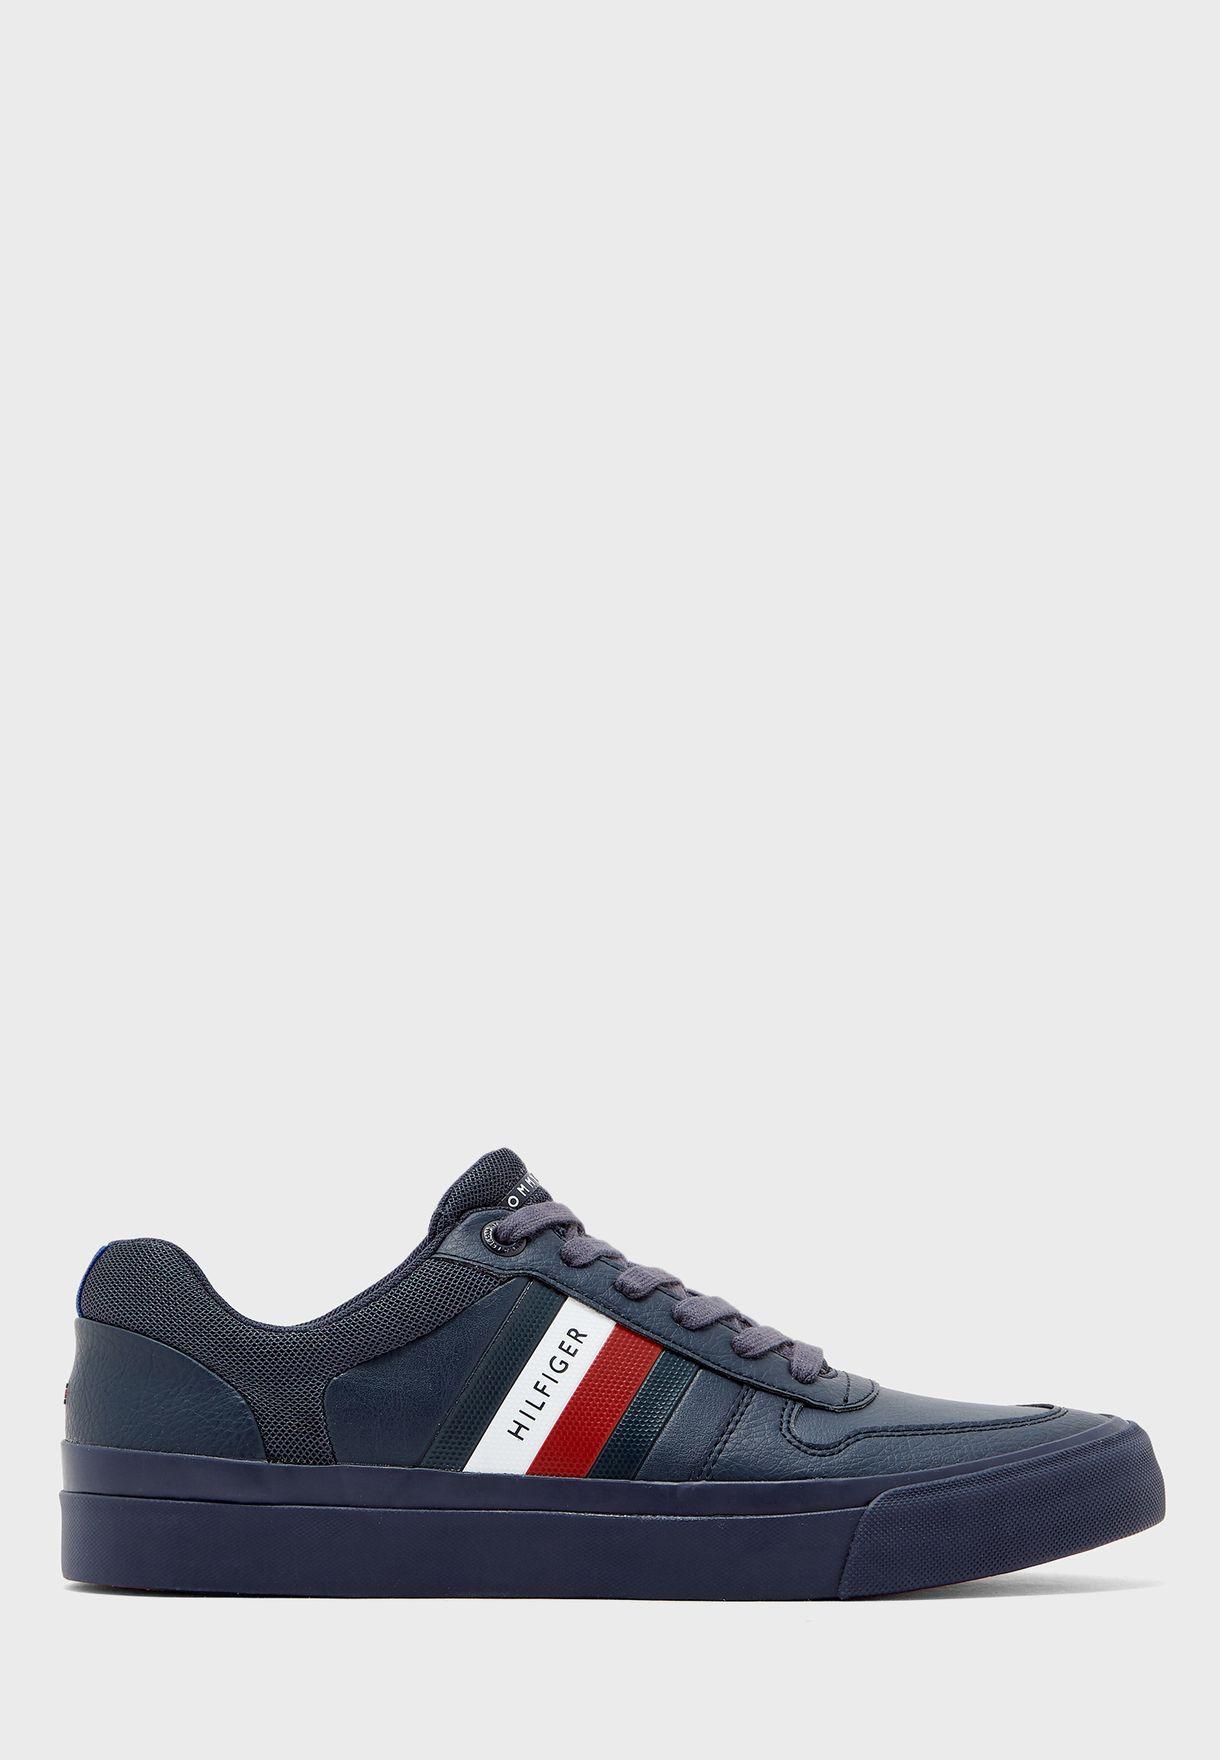 Core Corporate Modern Sneakers